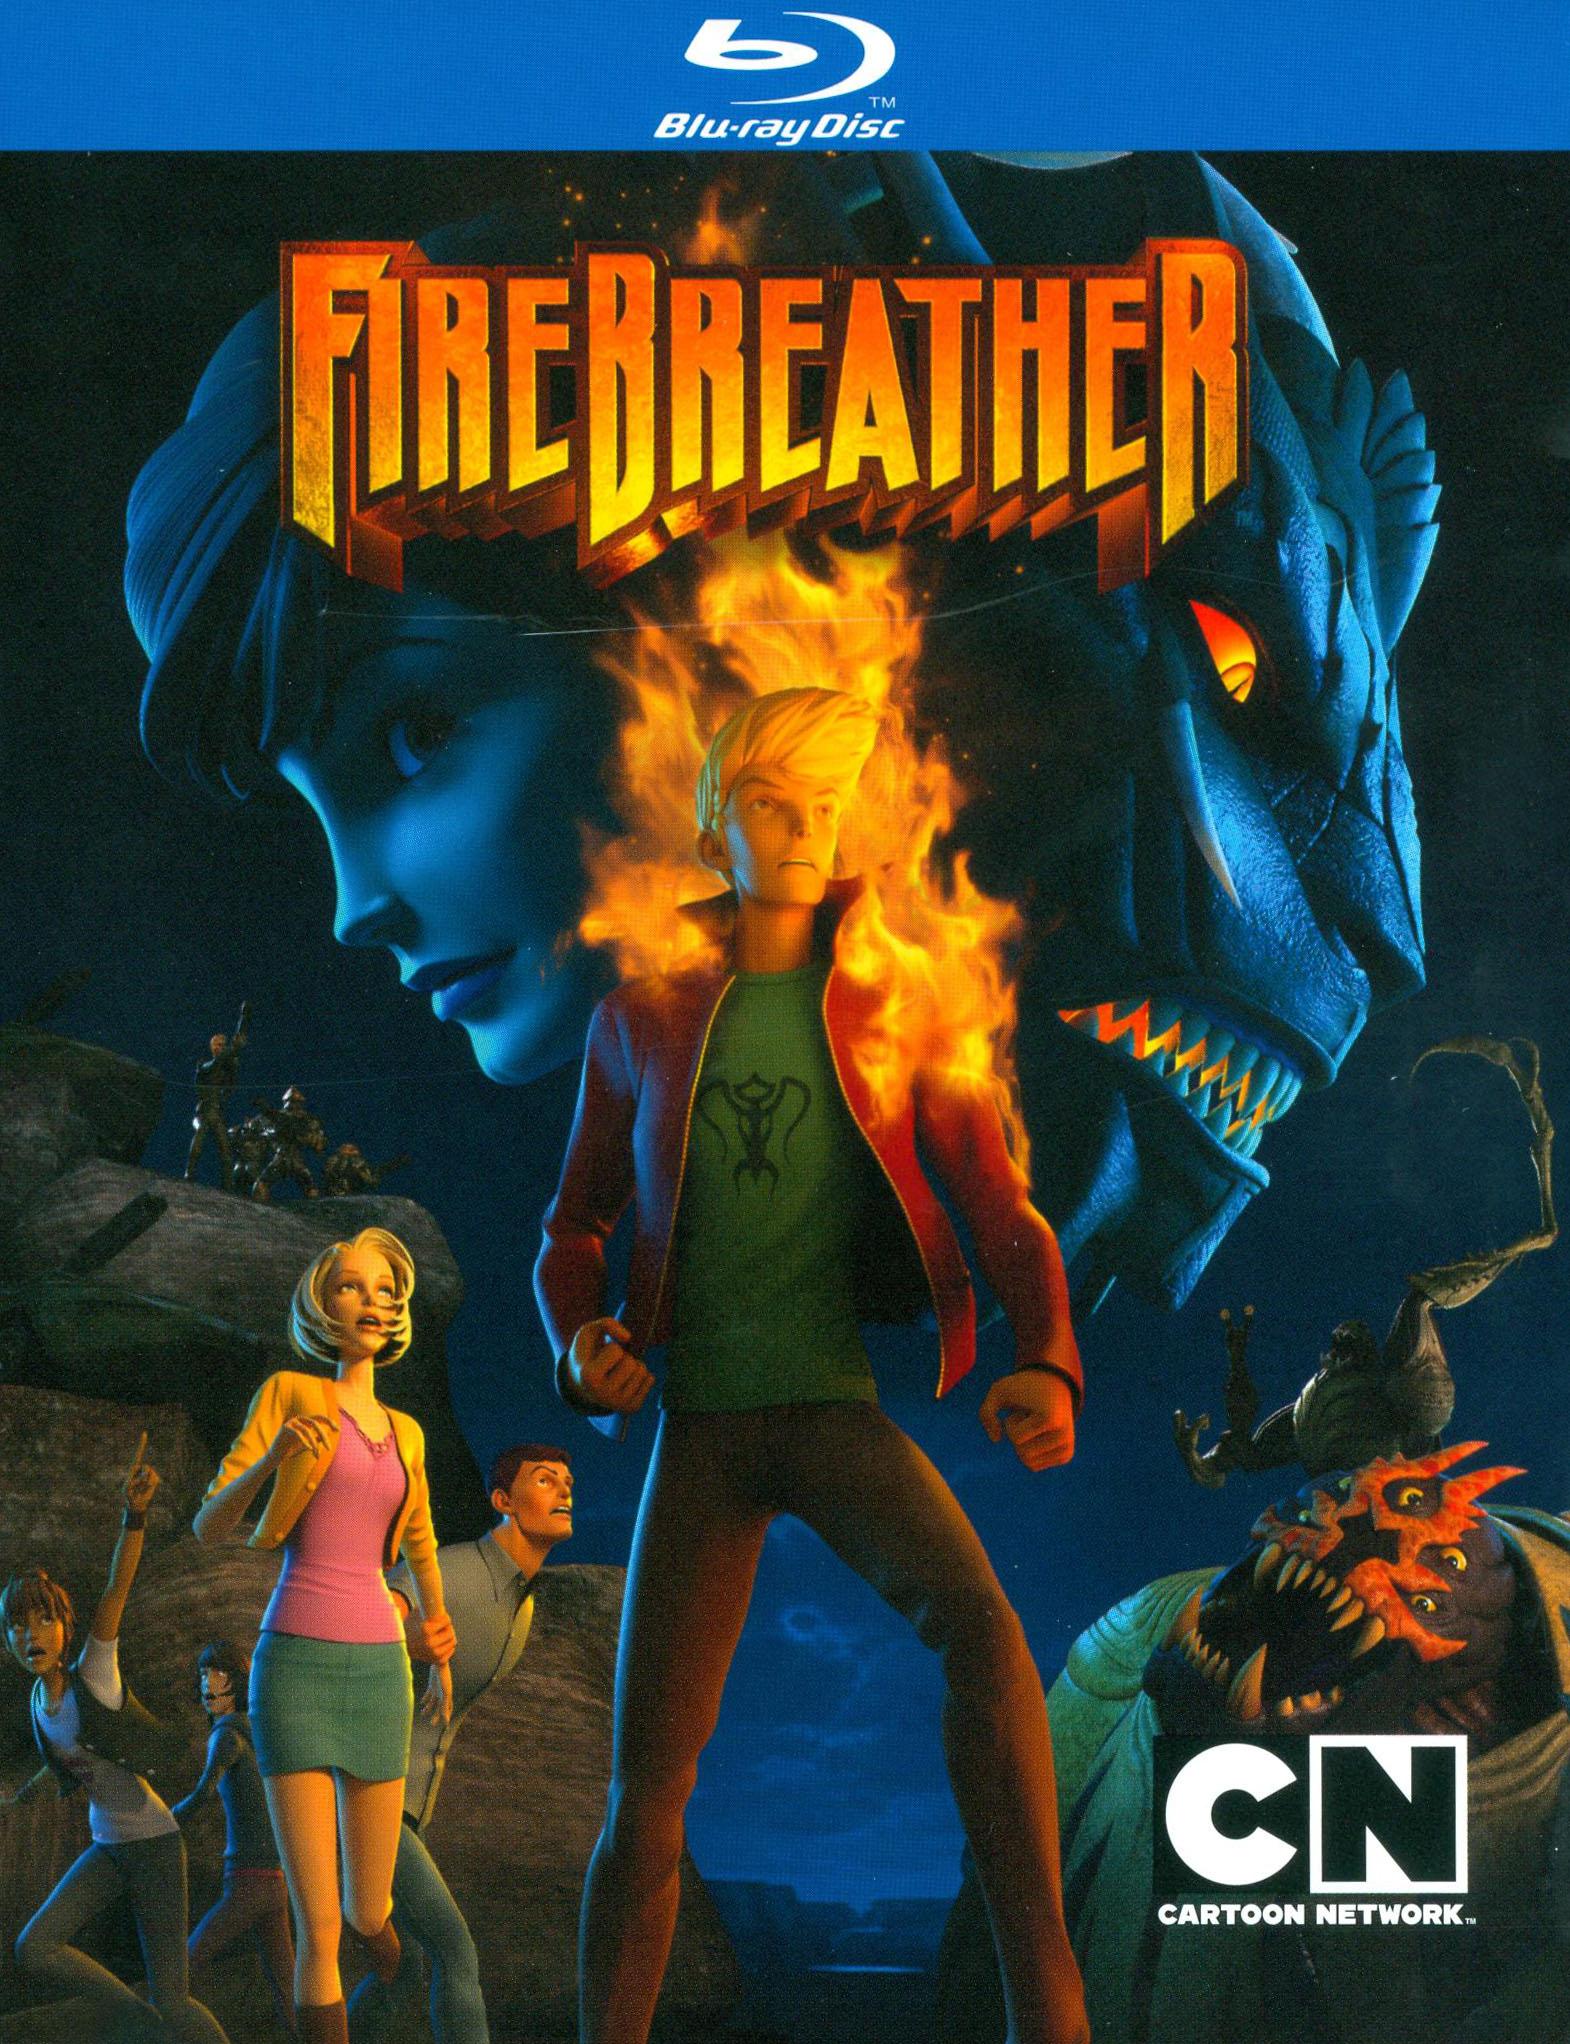 Firebreather [blu-ray] 2180438